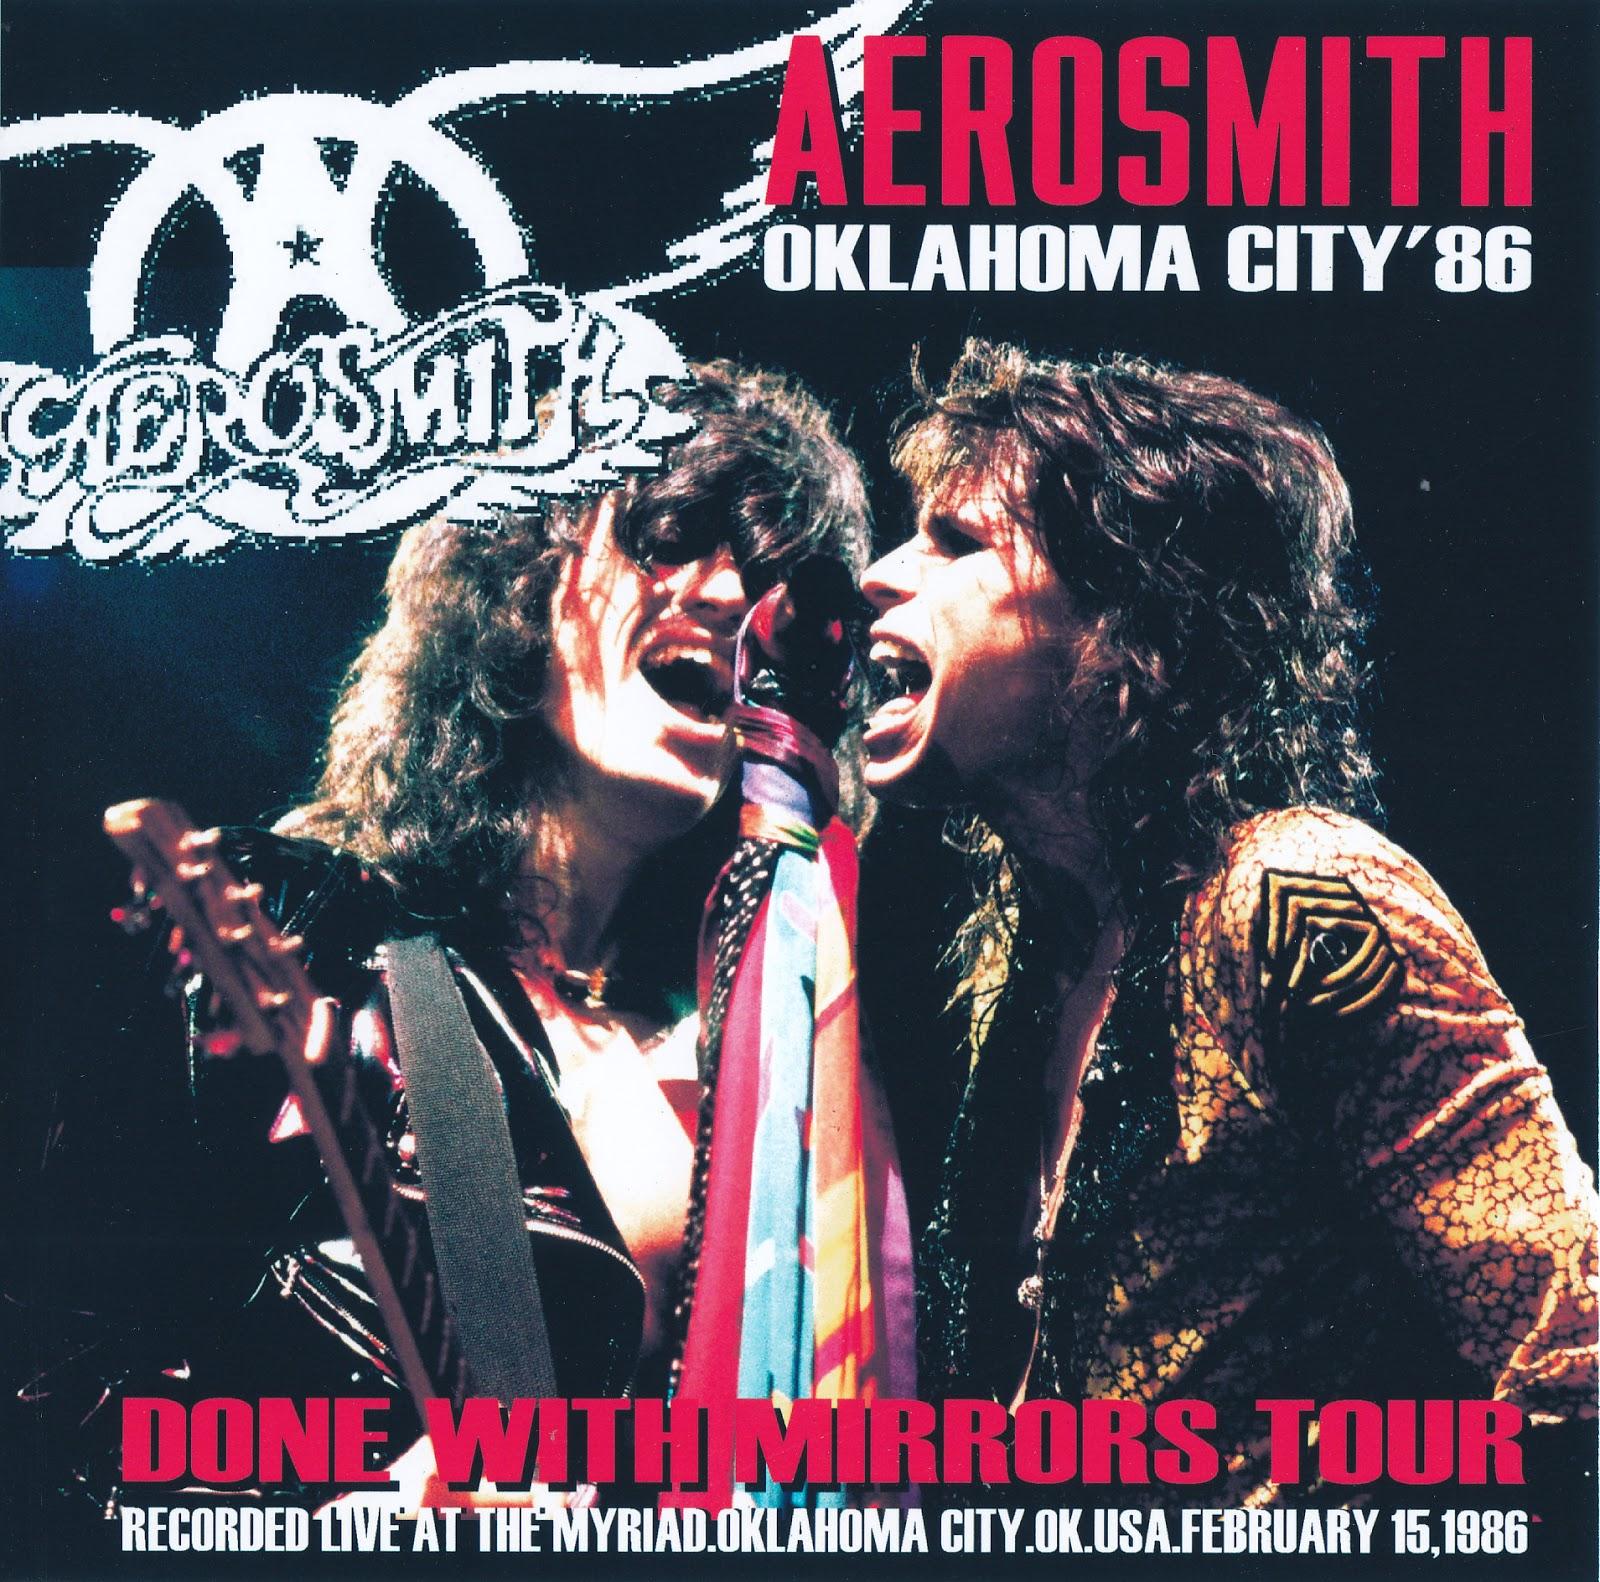 Aerosmith Bootlegs Cover Arts 9 1 15 10 1 15